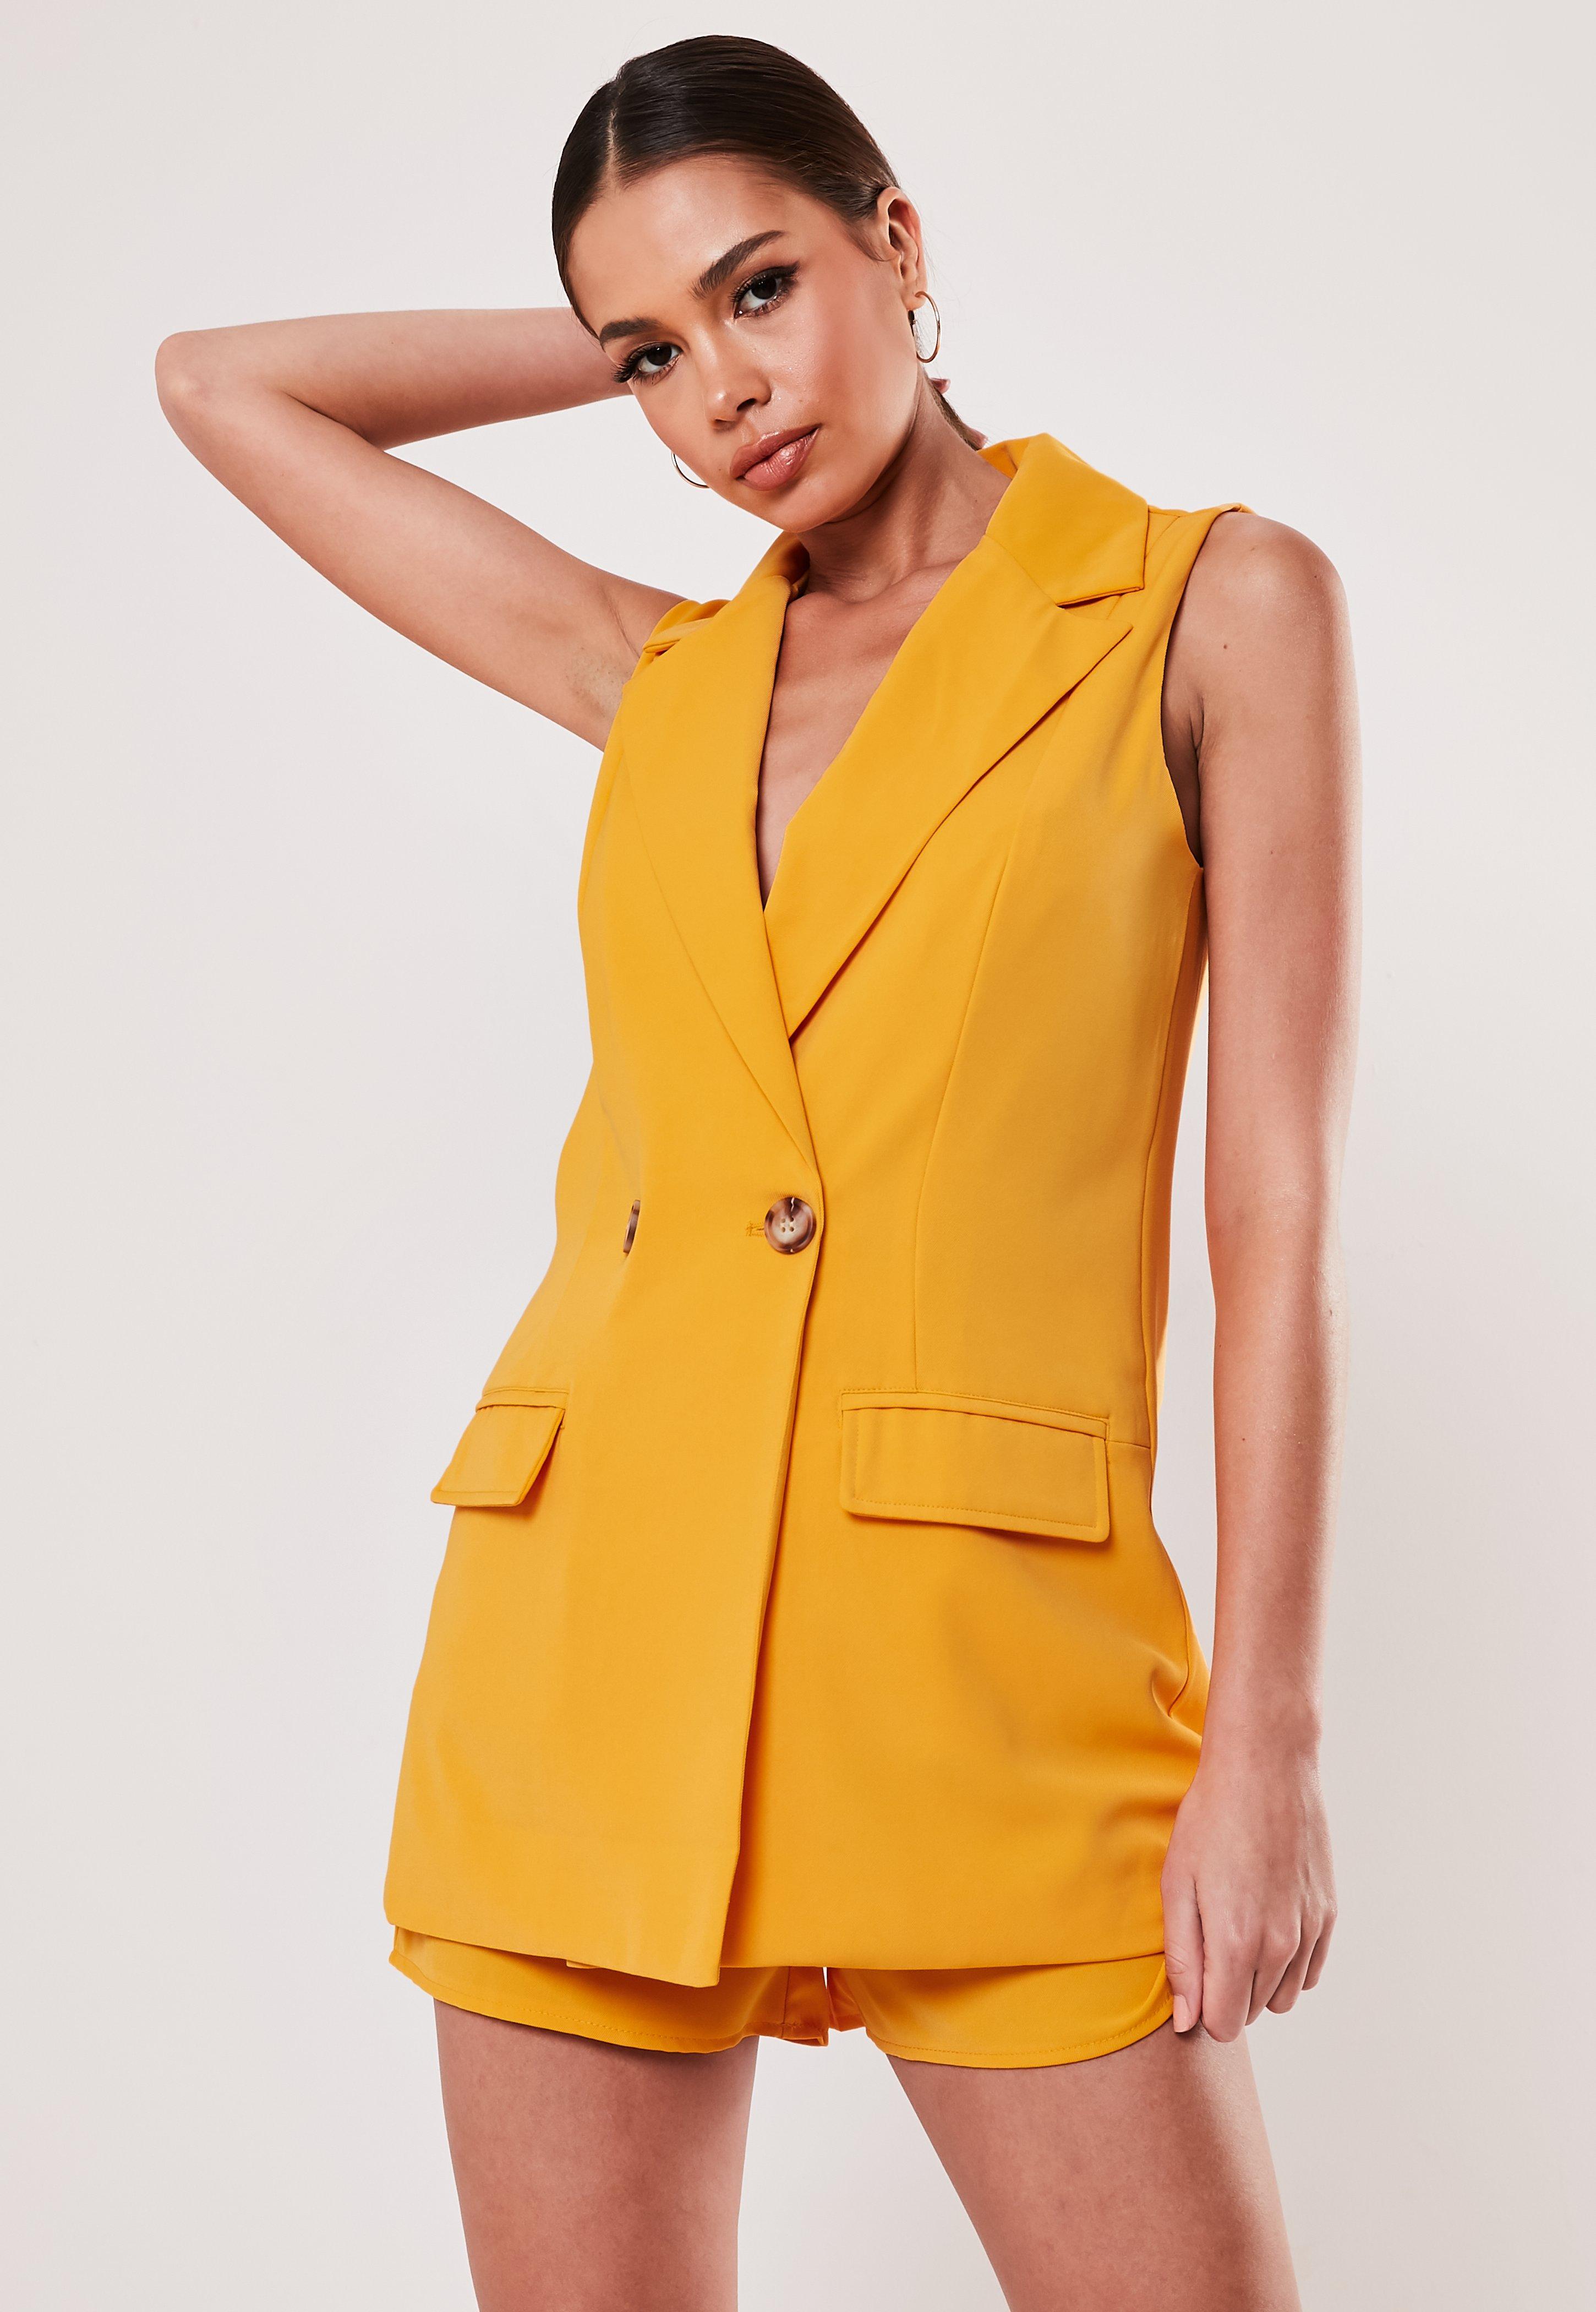 75b3b7fe3daf Blazers for Women - Shop Smart & Tweed Blazers UK - Missguided